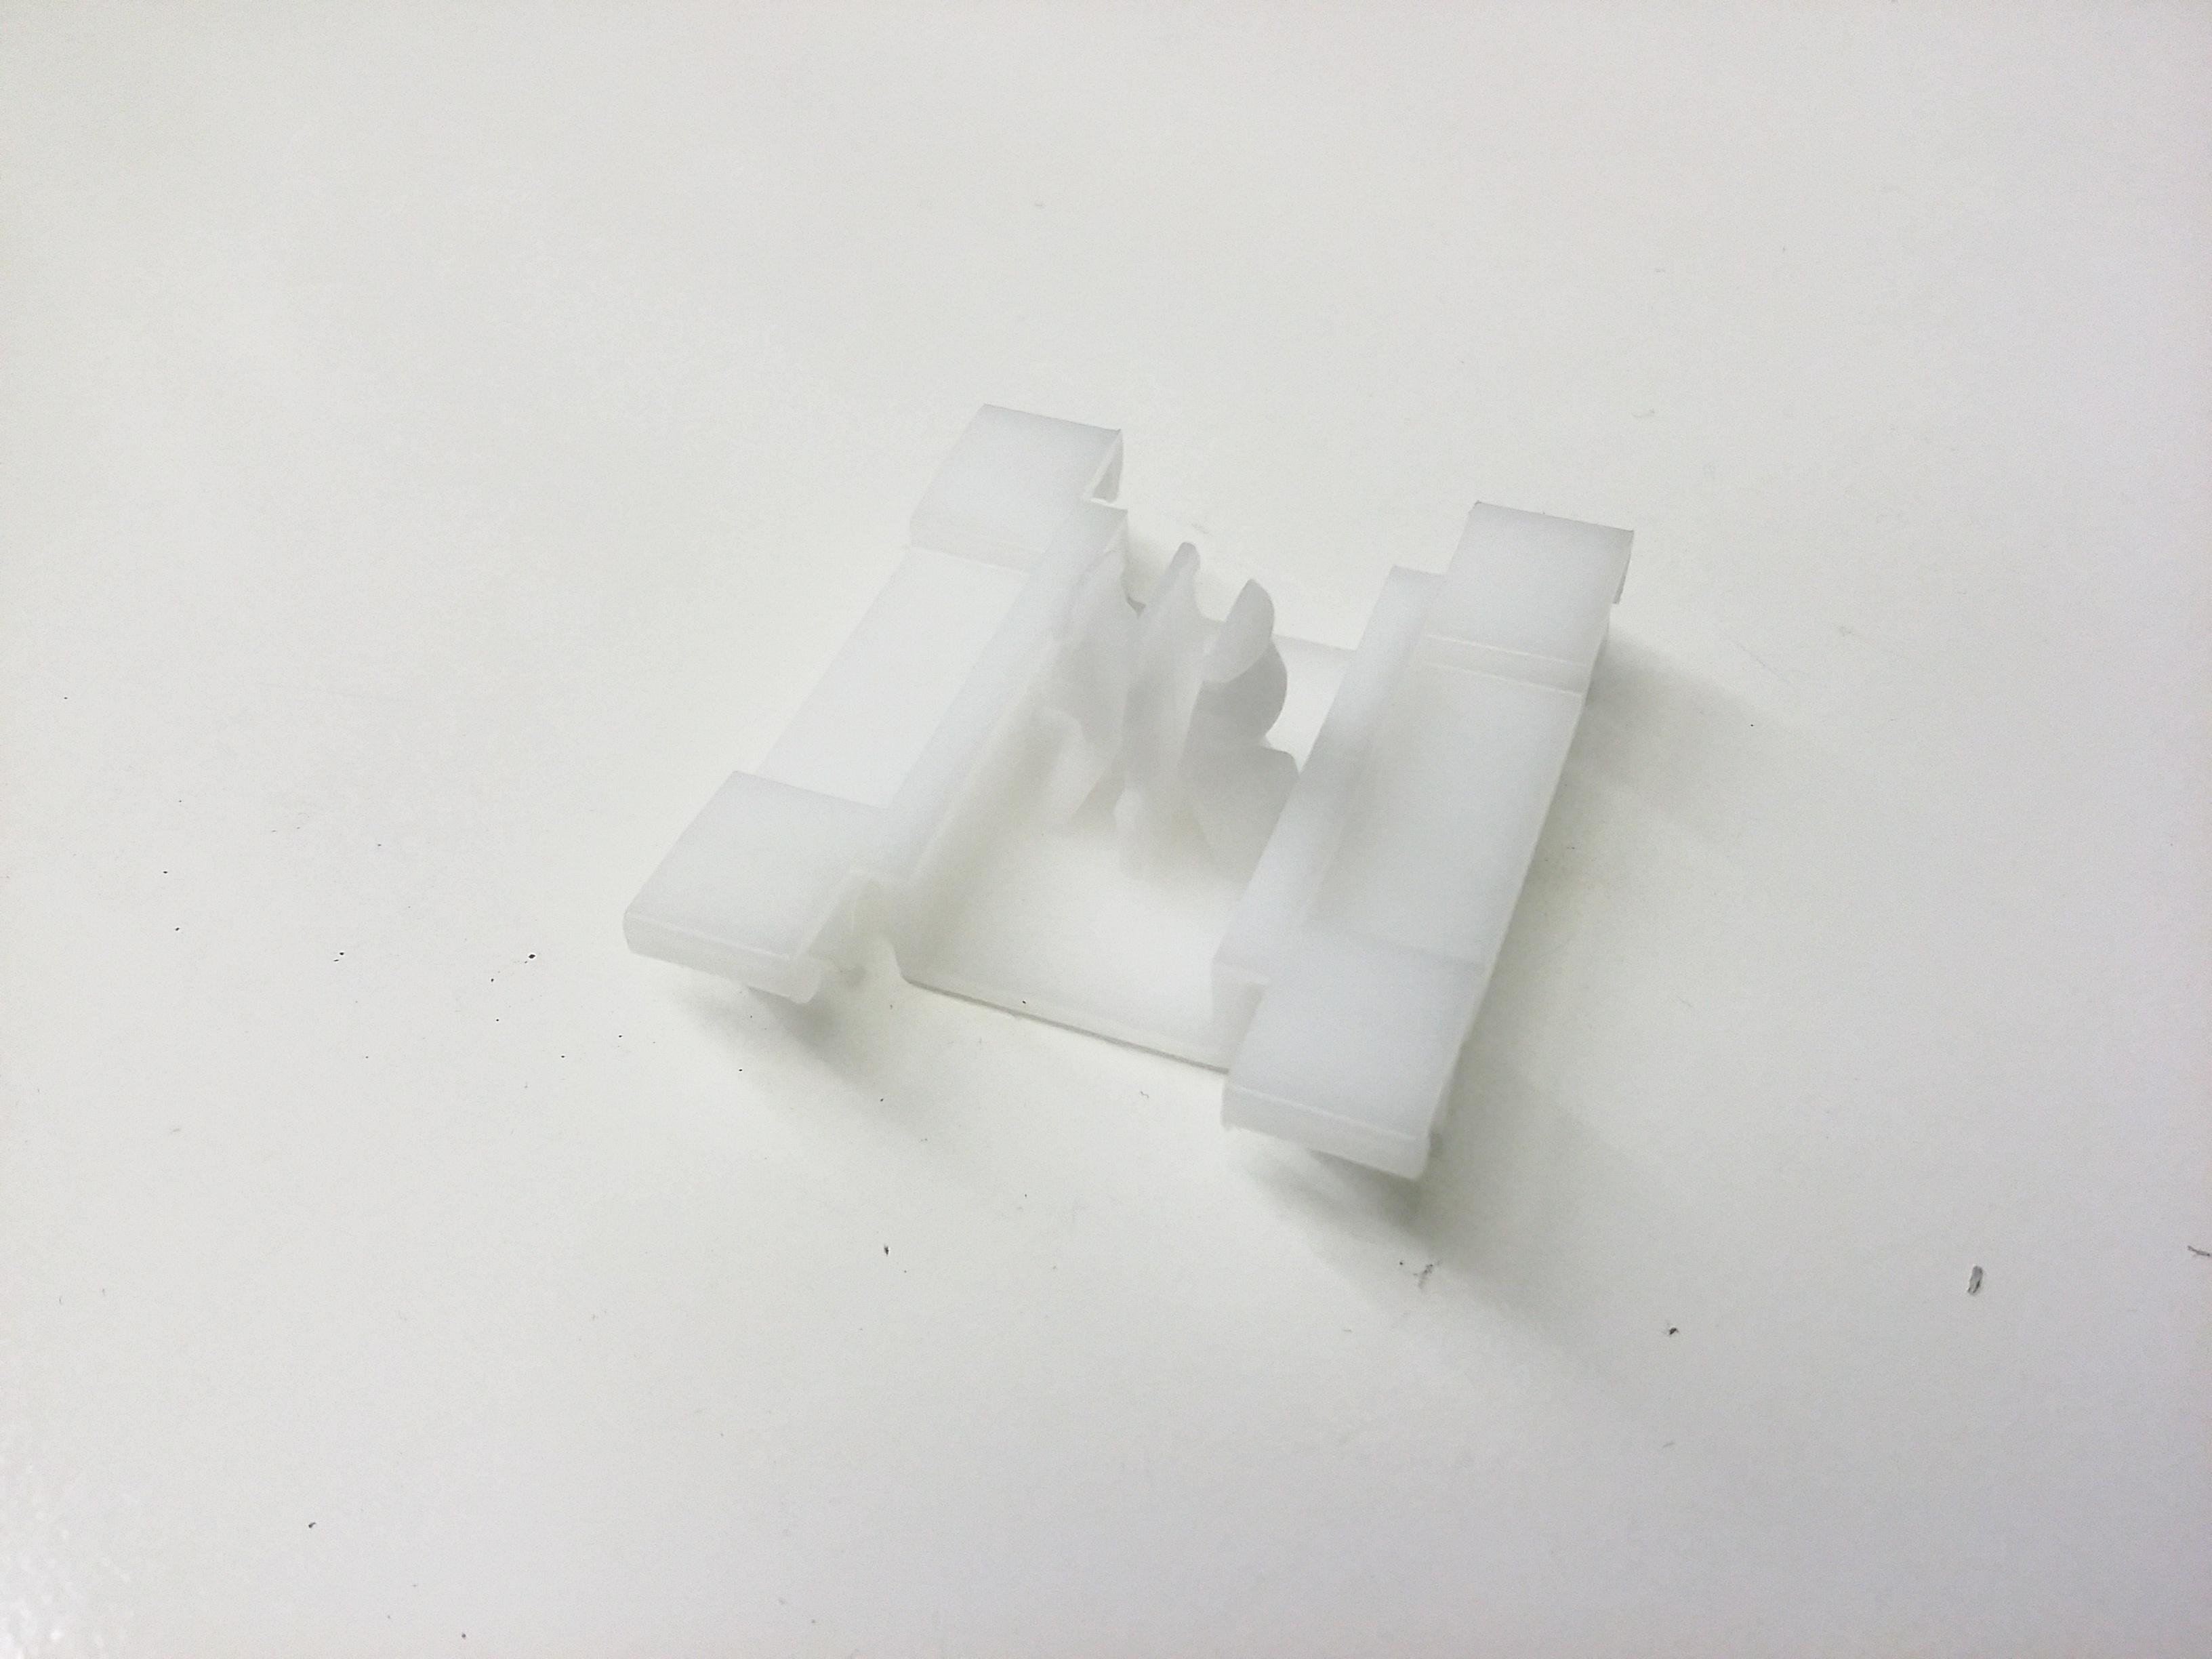 1h0853585 - Clip  Molding  2 Door  Front  Front  U0026 Rear  Front  Rear